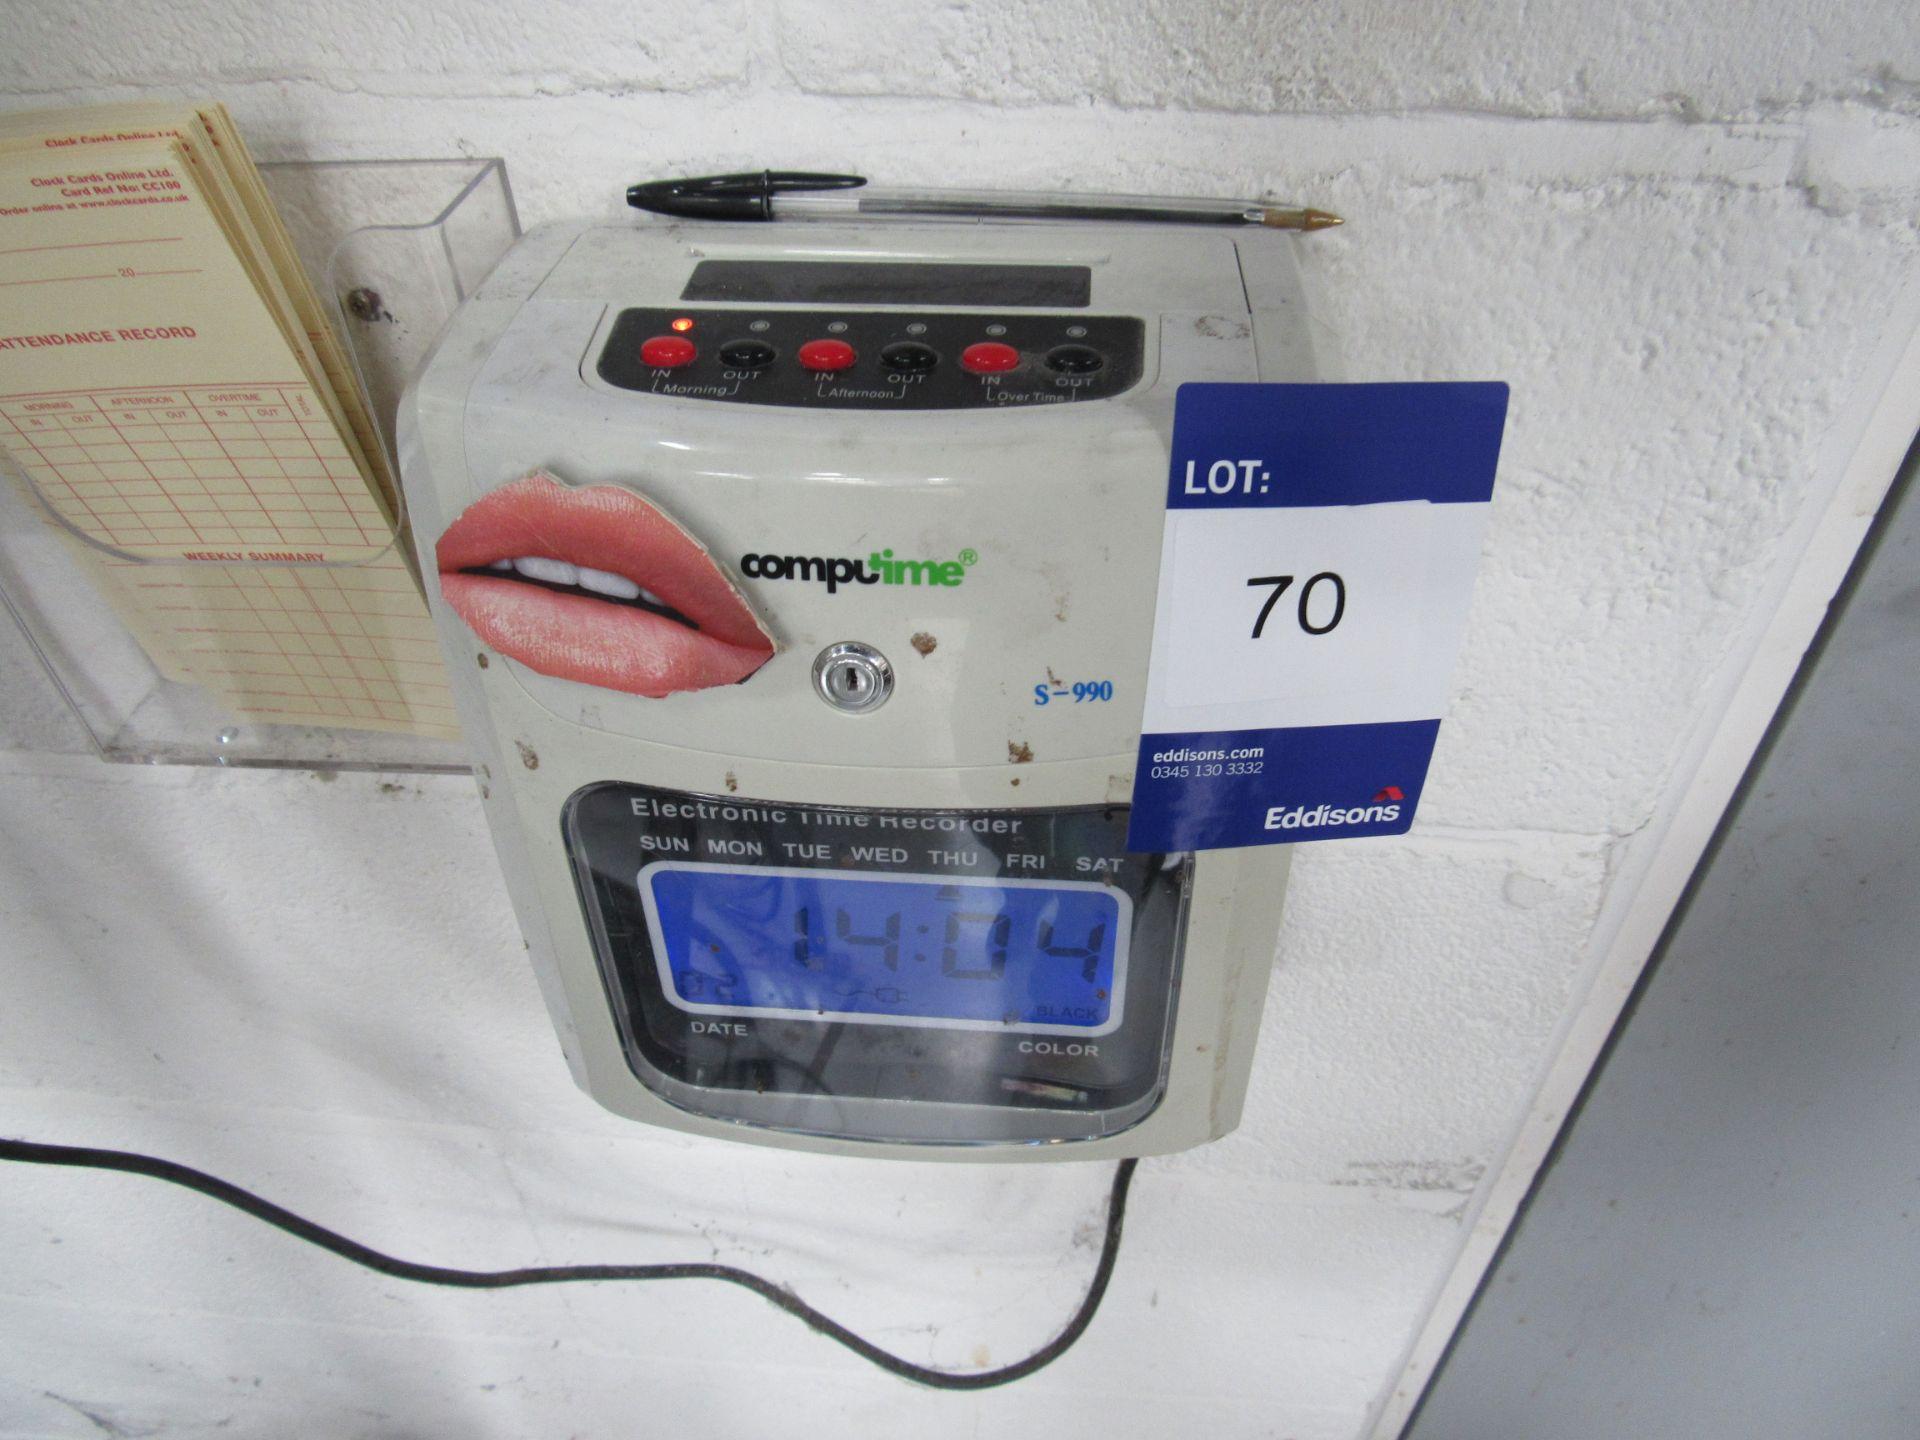 Computime S-990 Clocking In Machine - Image 2 of 2